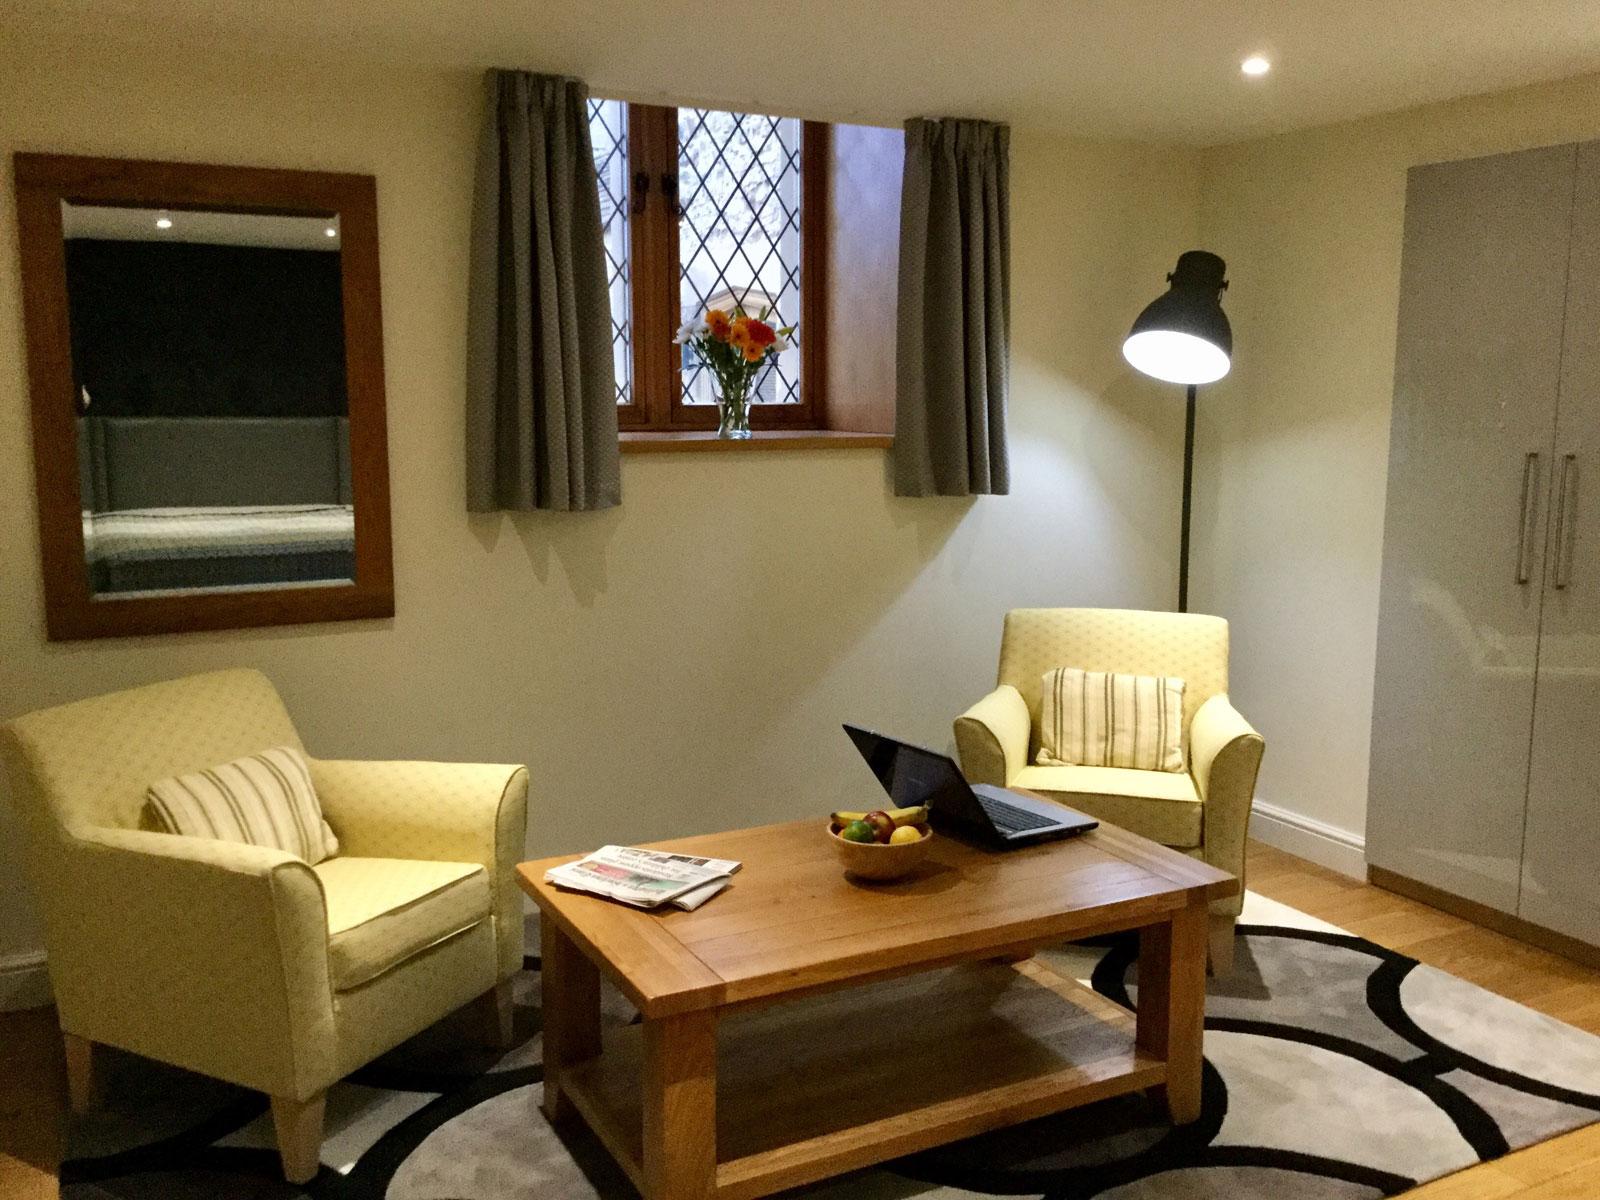 Garden rooms at snape castle mews yorkshire dales - Free room design website ...